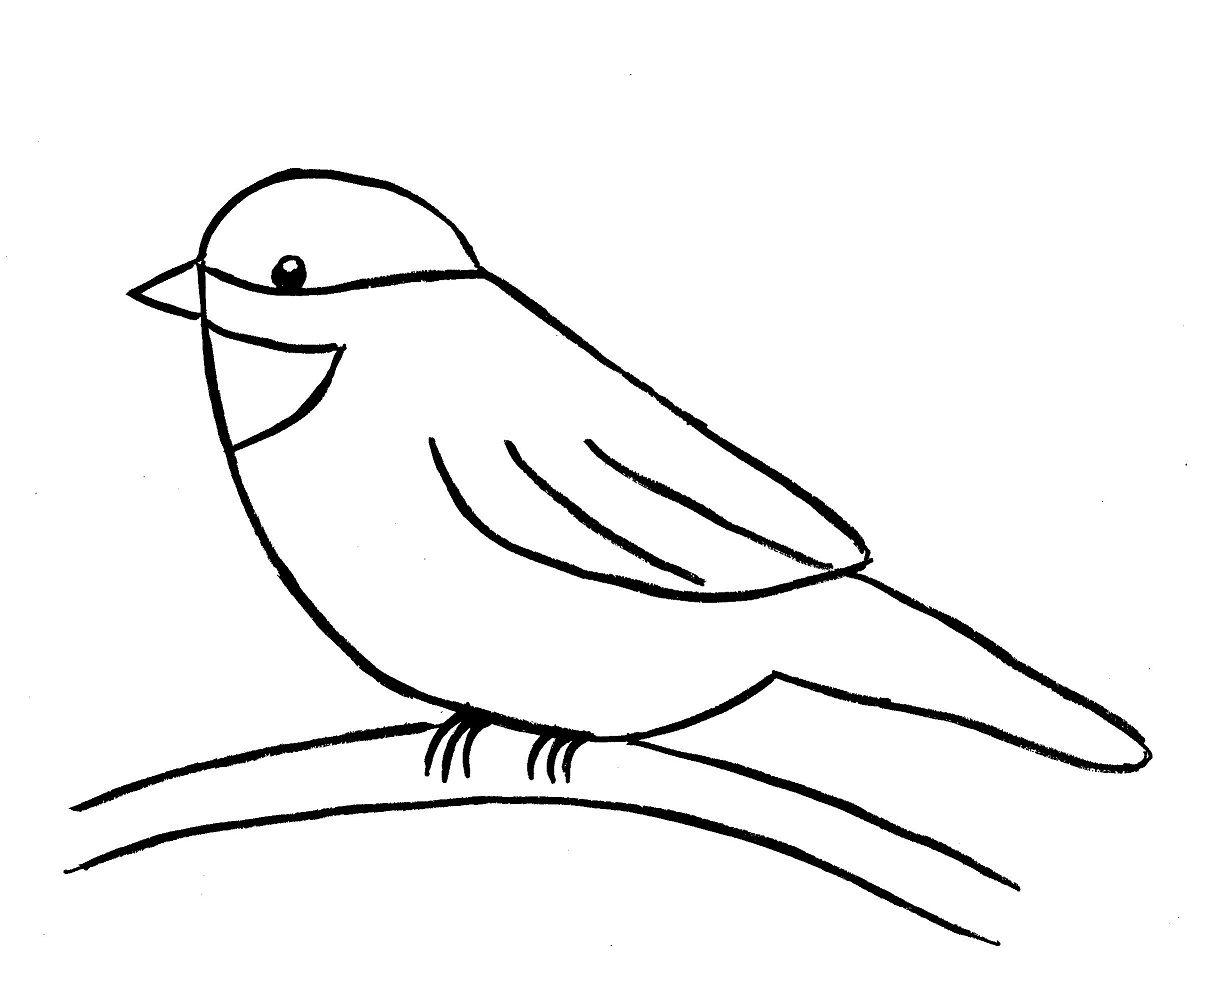 1211x1002 How To Draw A Bird Step